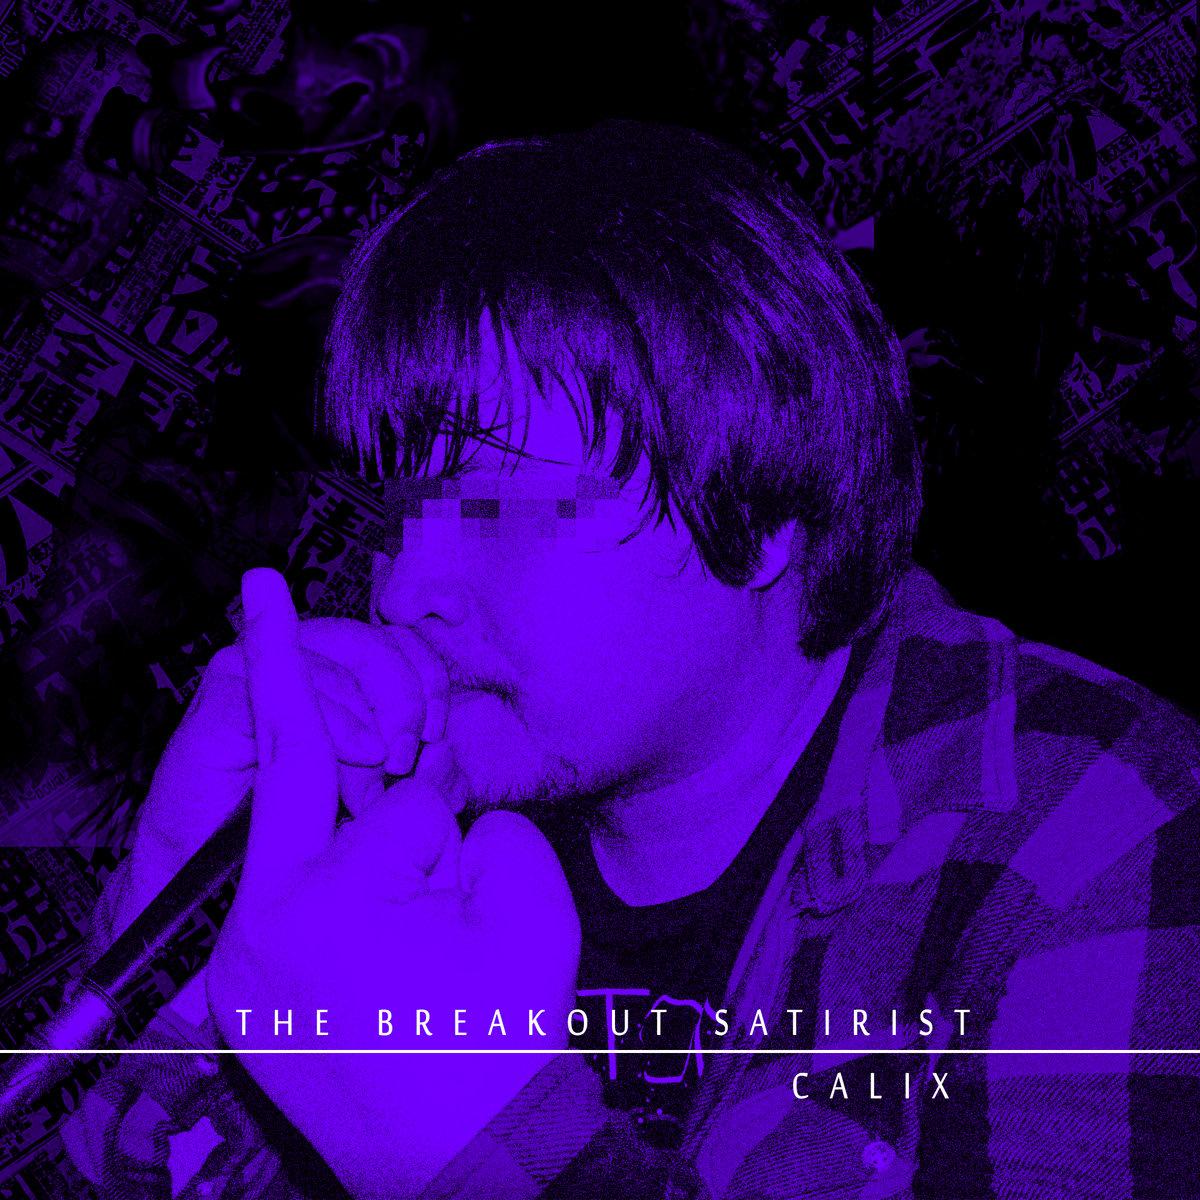 The Breakout Satirist | Calix